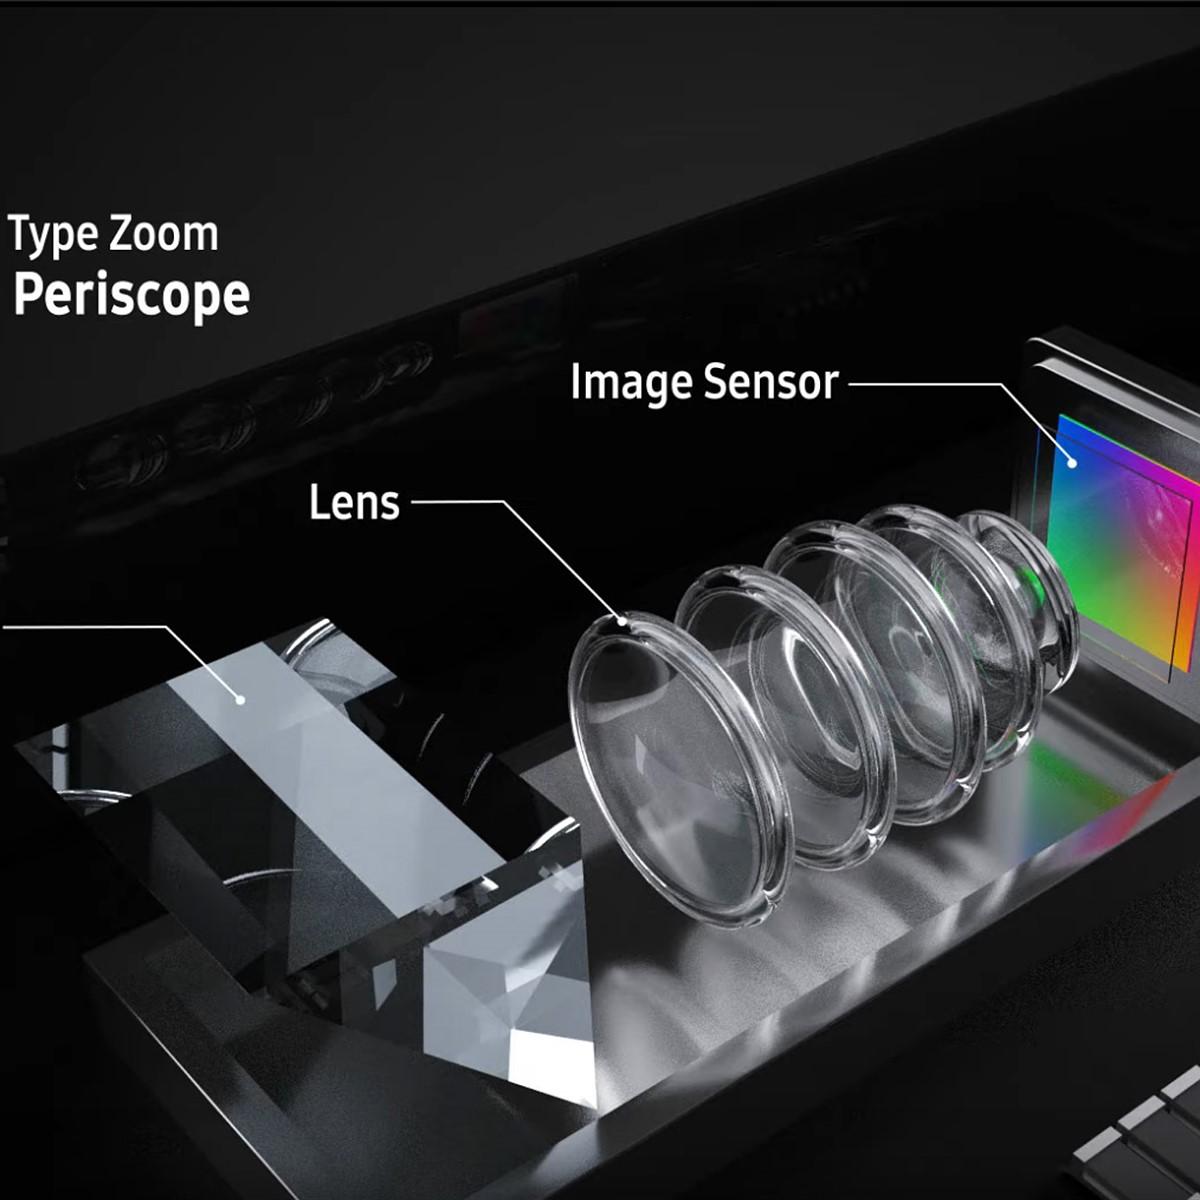 2022 iPhone, Periskop Mercekli Kameralı!